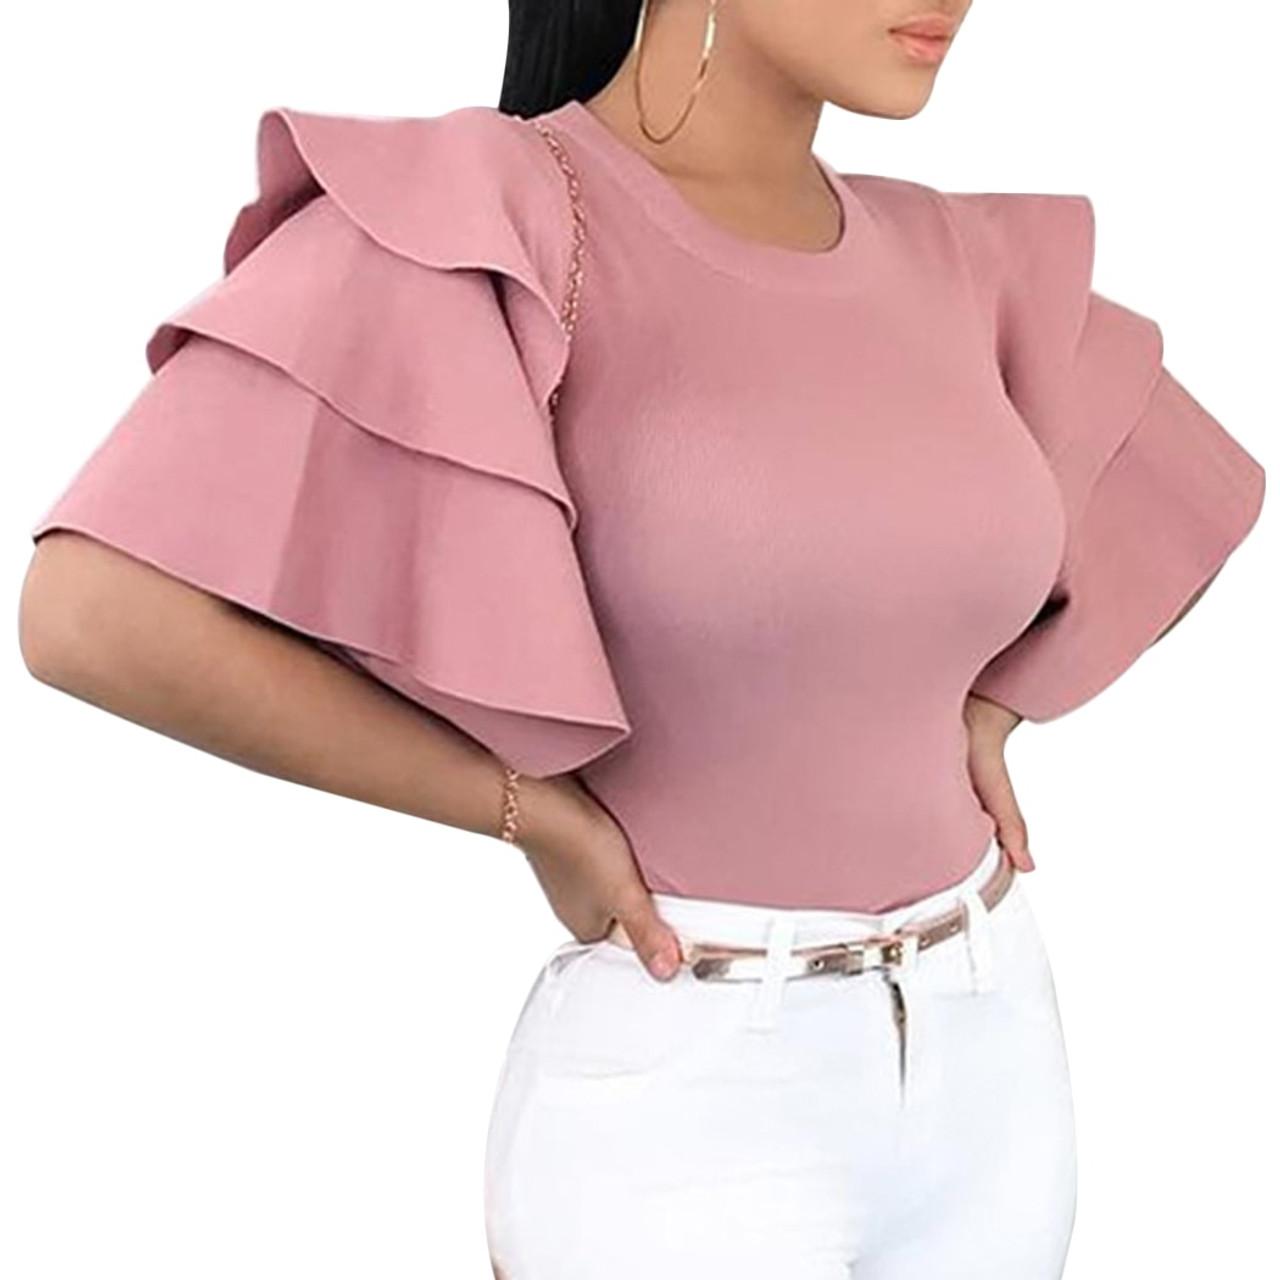 2c3ced1af8c2d 2018 Women Ruffle Sleeve Blouse Tops Elegant Round Neck Slim Office Shirt  Ladies Korean Fashion Pink ...